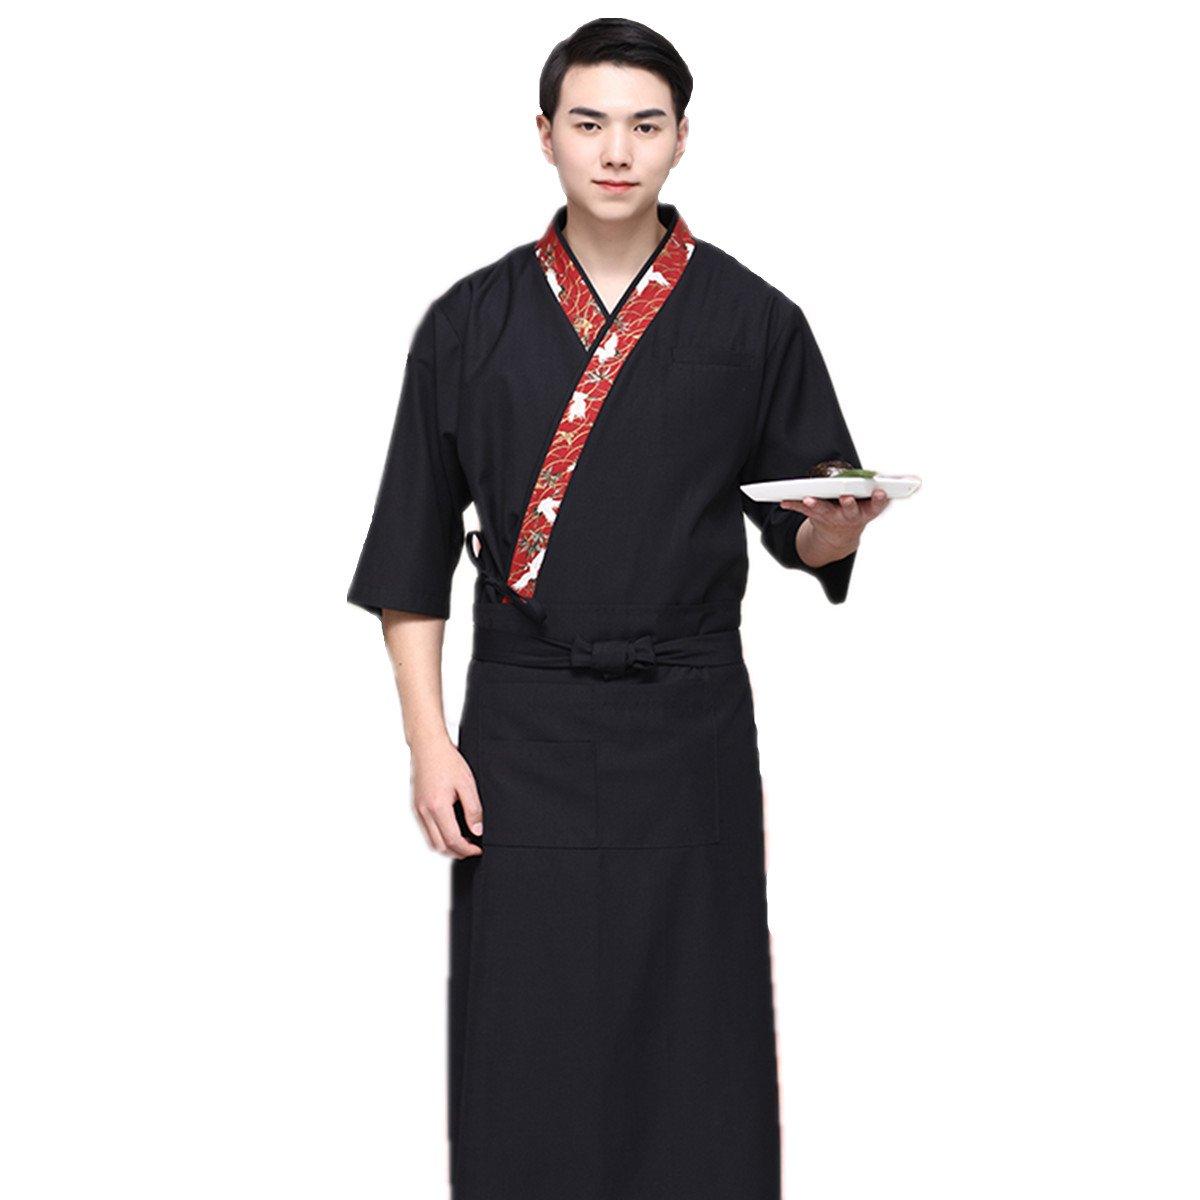 XINFU Sushi Chef White Crane 3/4 Long Sleeve Restaurant Japanese Kimono Kitchen Work Uniform